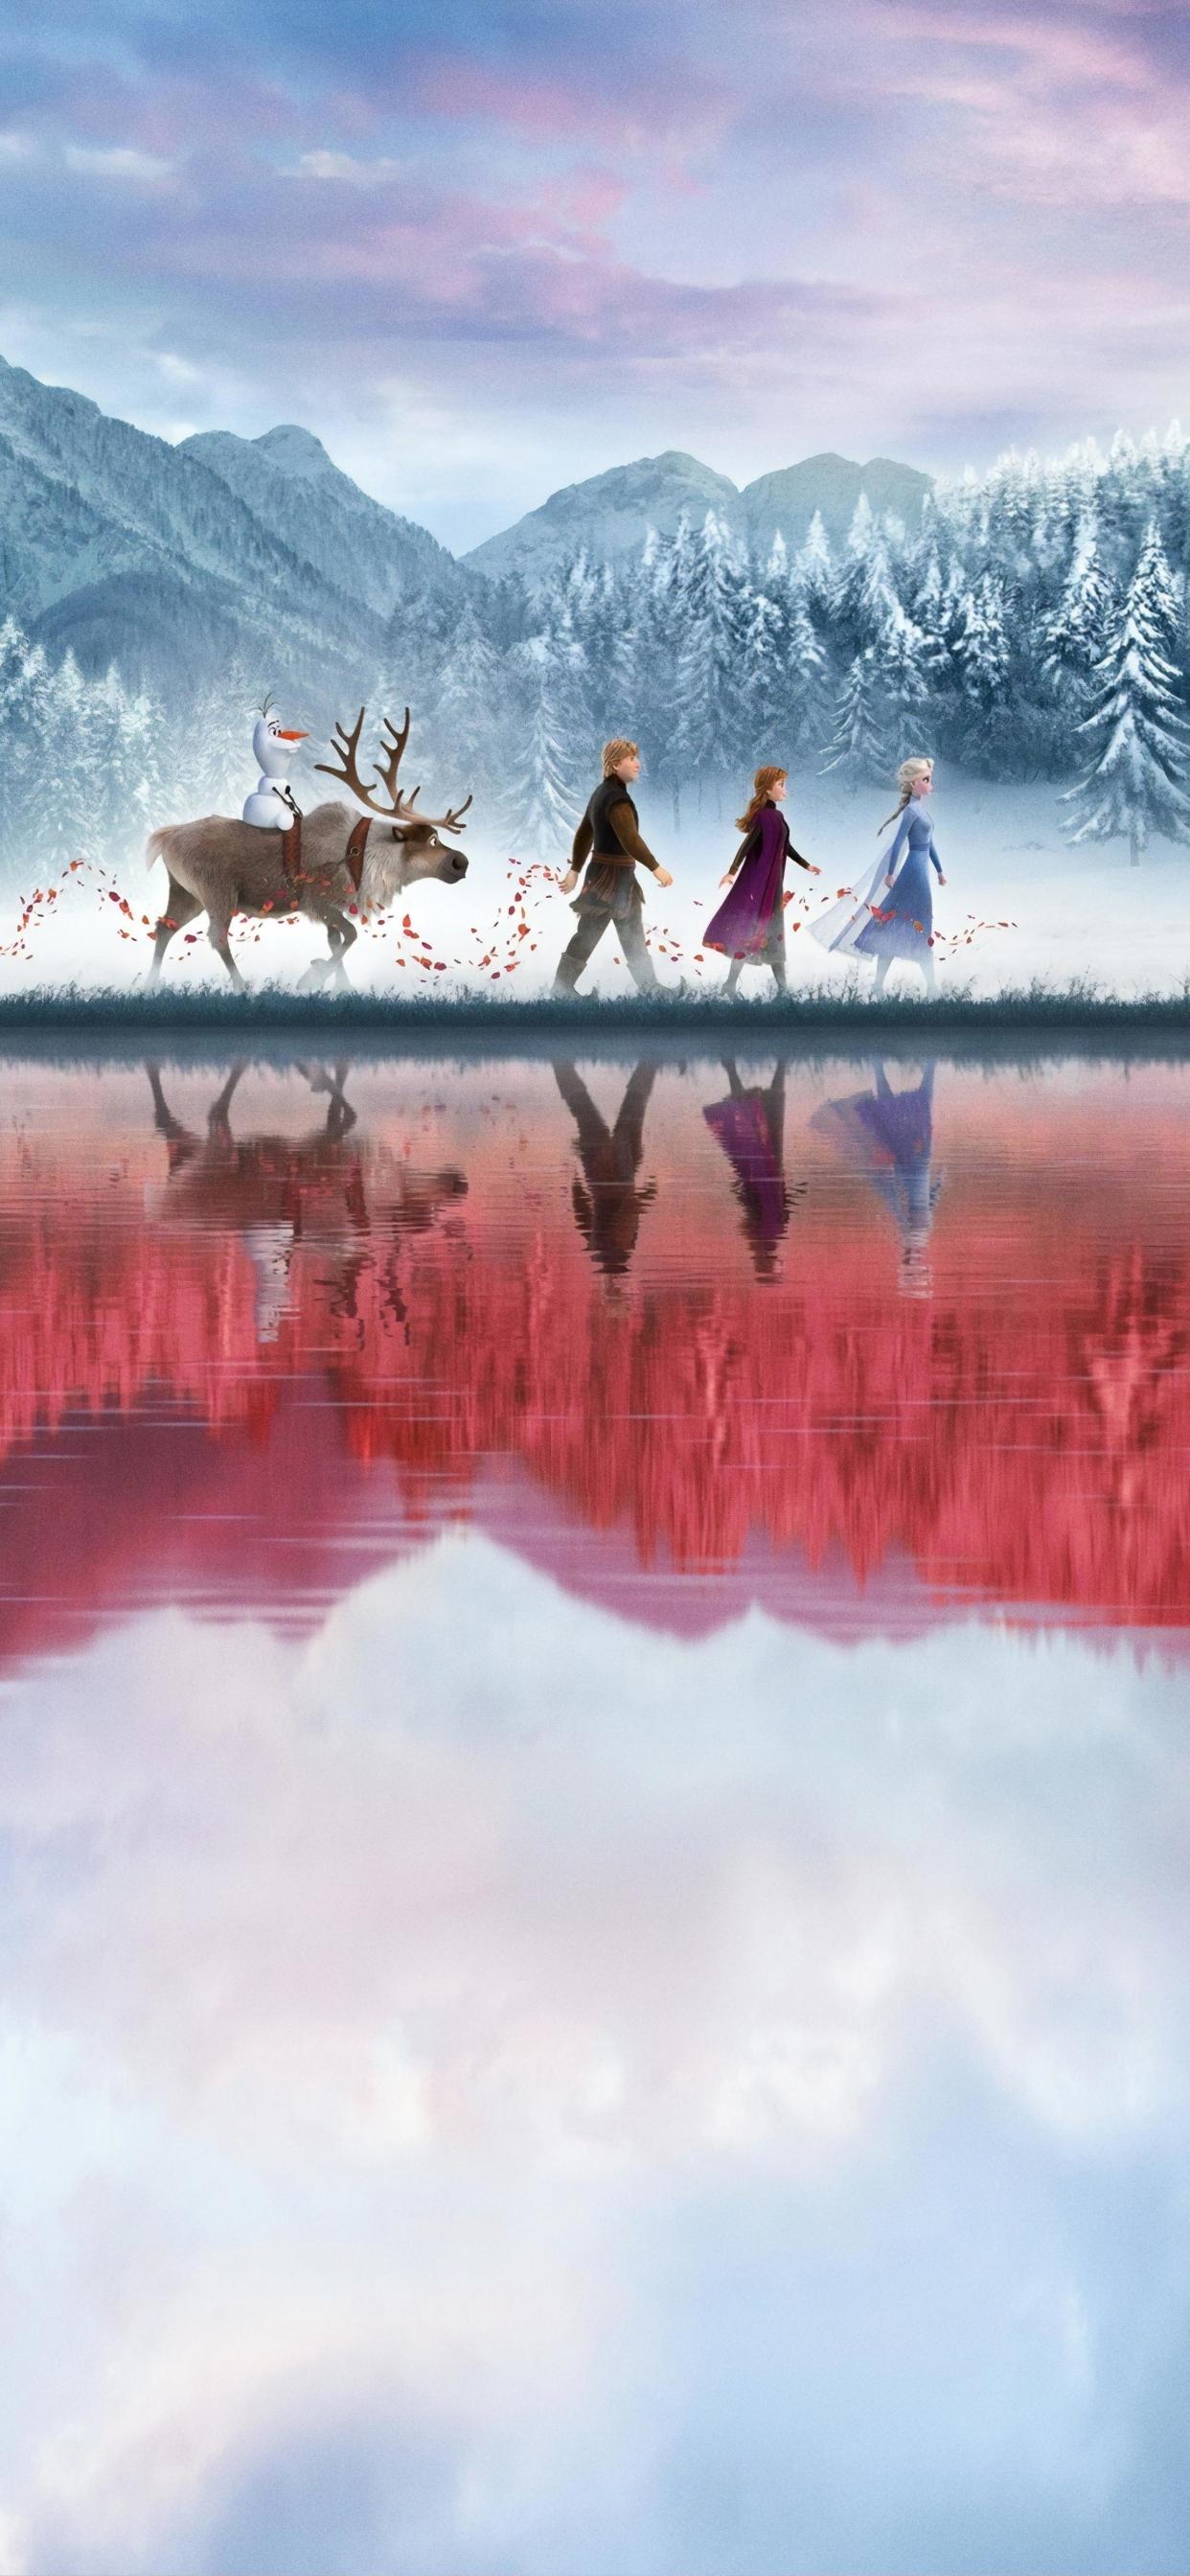 1242x2688 Frozen 2 Movie Iphone XS MAX Wallpaper, HD Movies